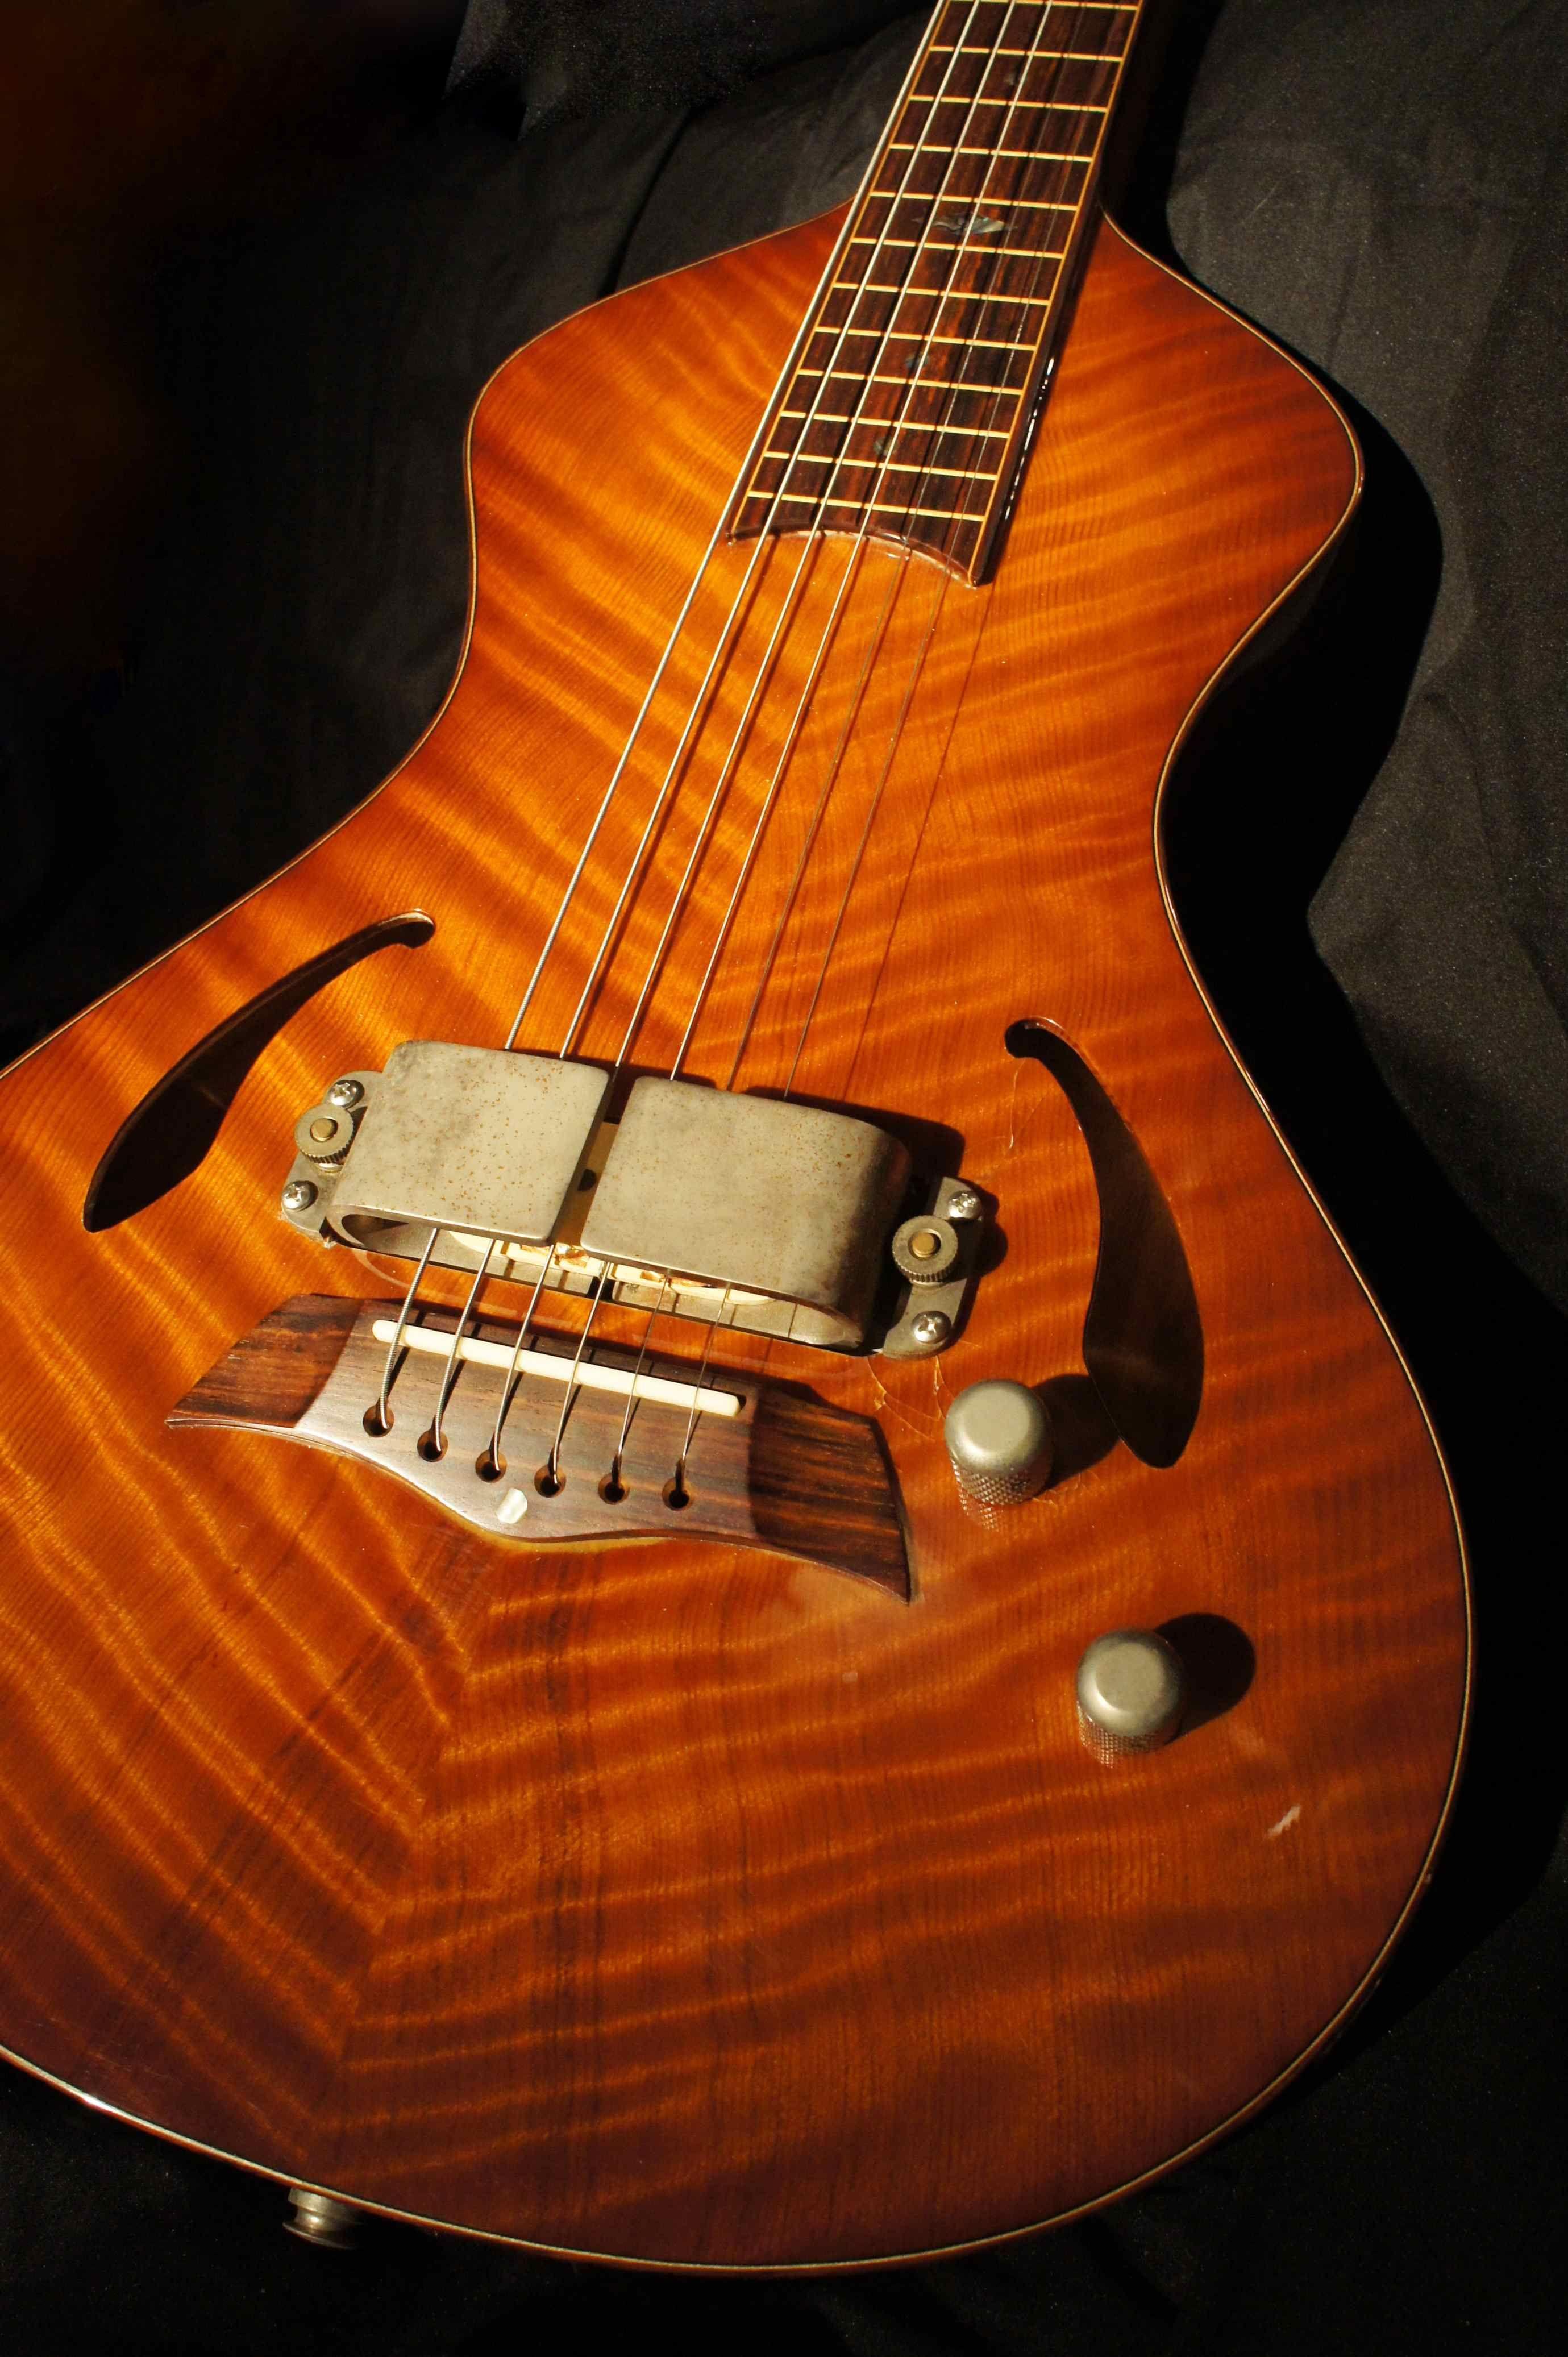 2003 asher guitars custom dual tone electric lap steel guitar for rich robinson the black. Black Bedroom Furniture Sets. Home Design Ideas